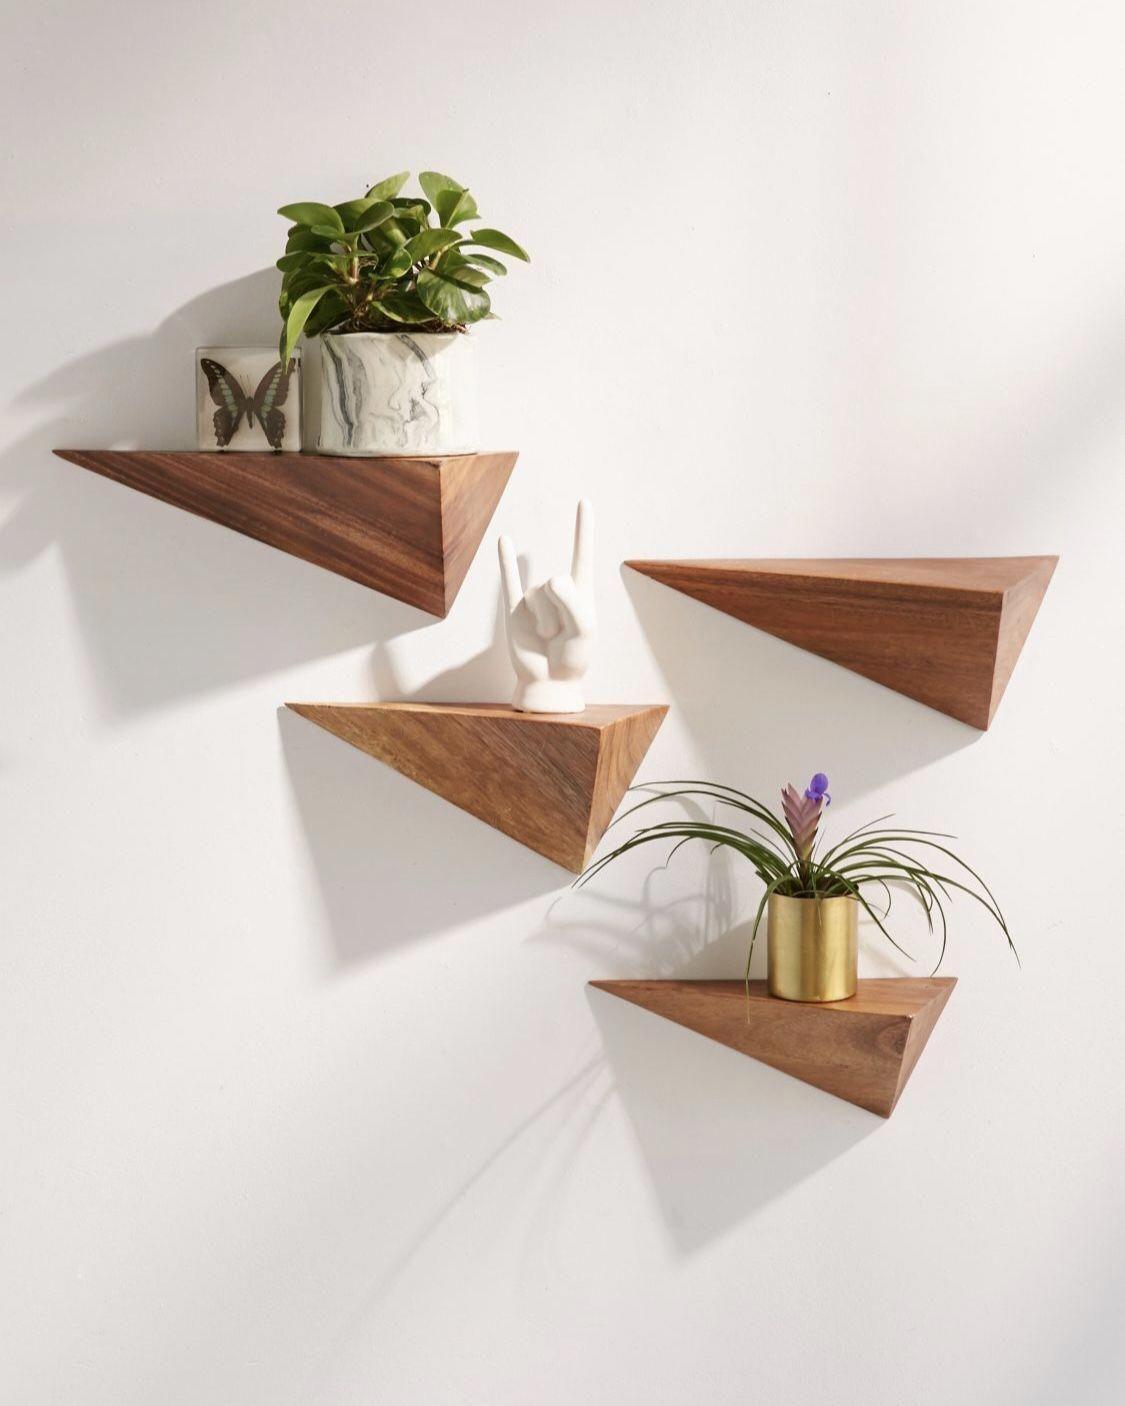 3-D Pyramid Ledge | Find The Best Designer Stuff Online